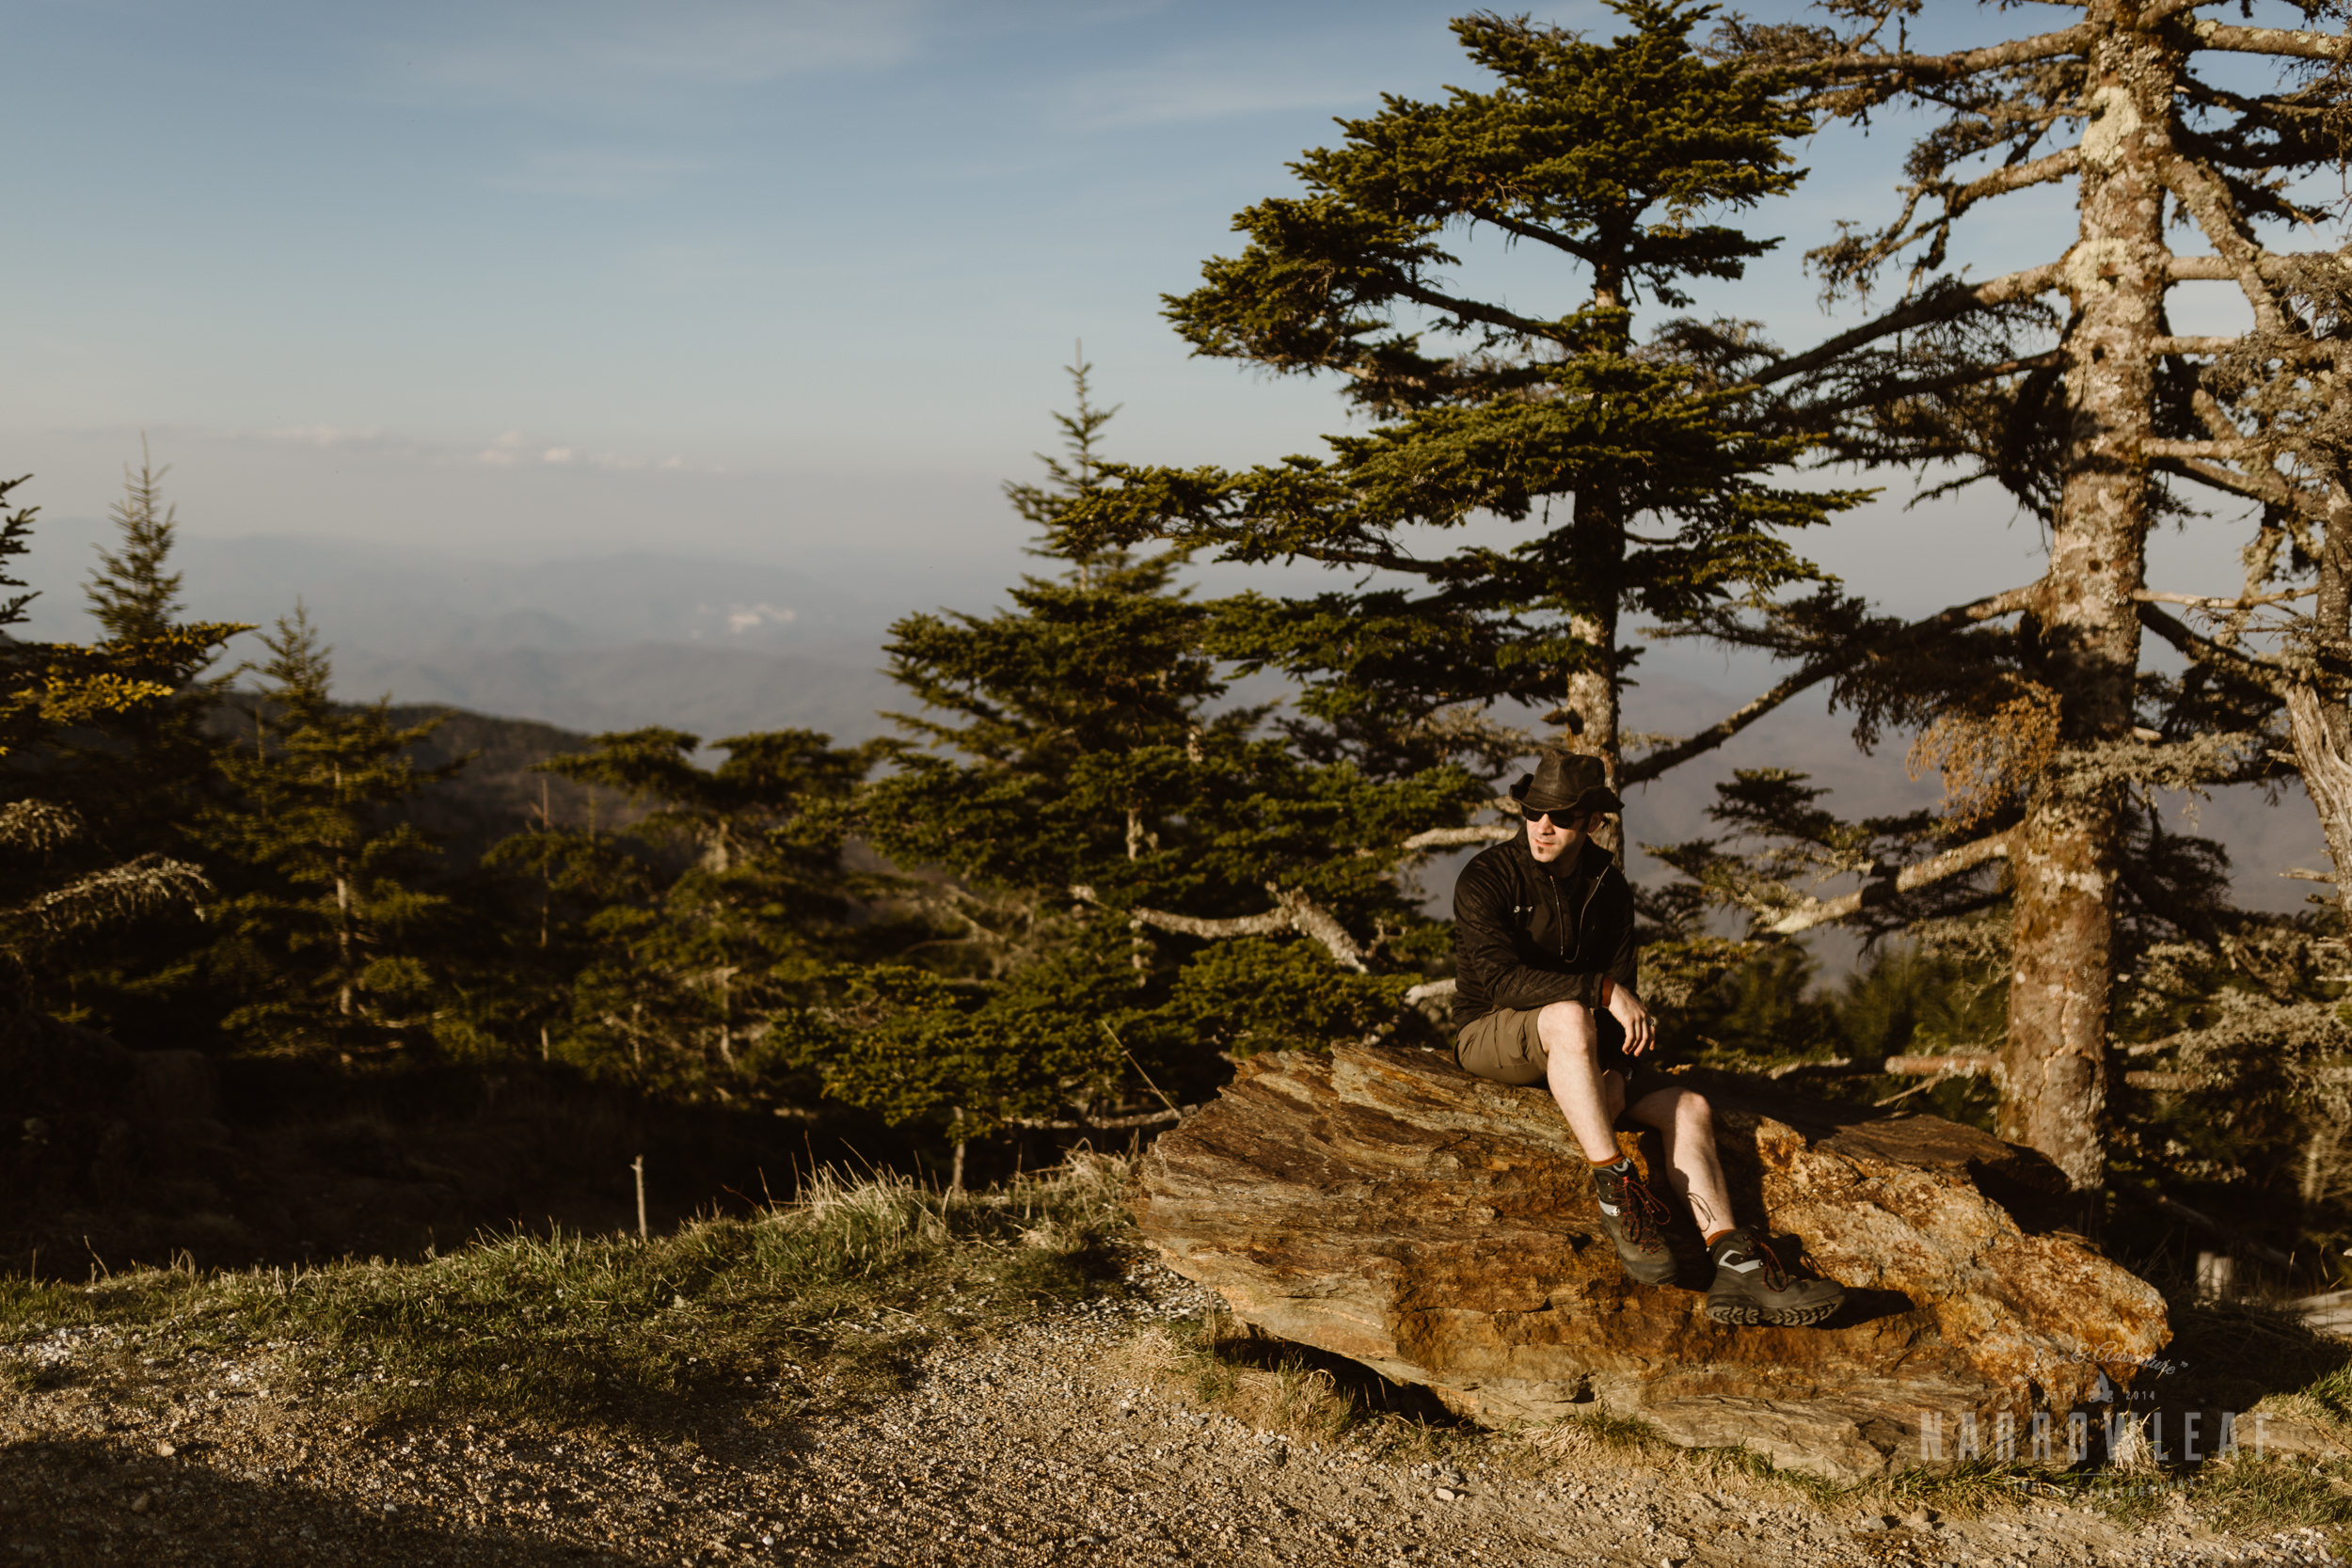 Blue-Ridge-mountains-North-Carolina-elopement-photographer-Narrowleaf_Love_and_Adventure_Photography-0303.jpg